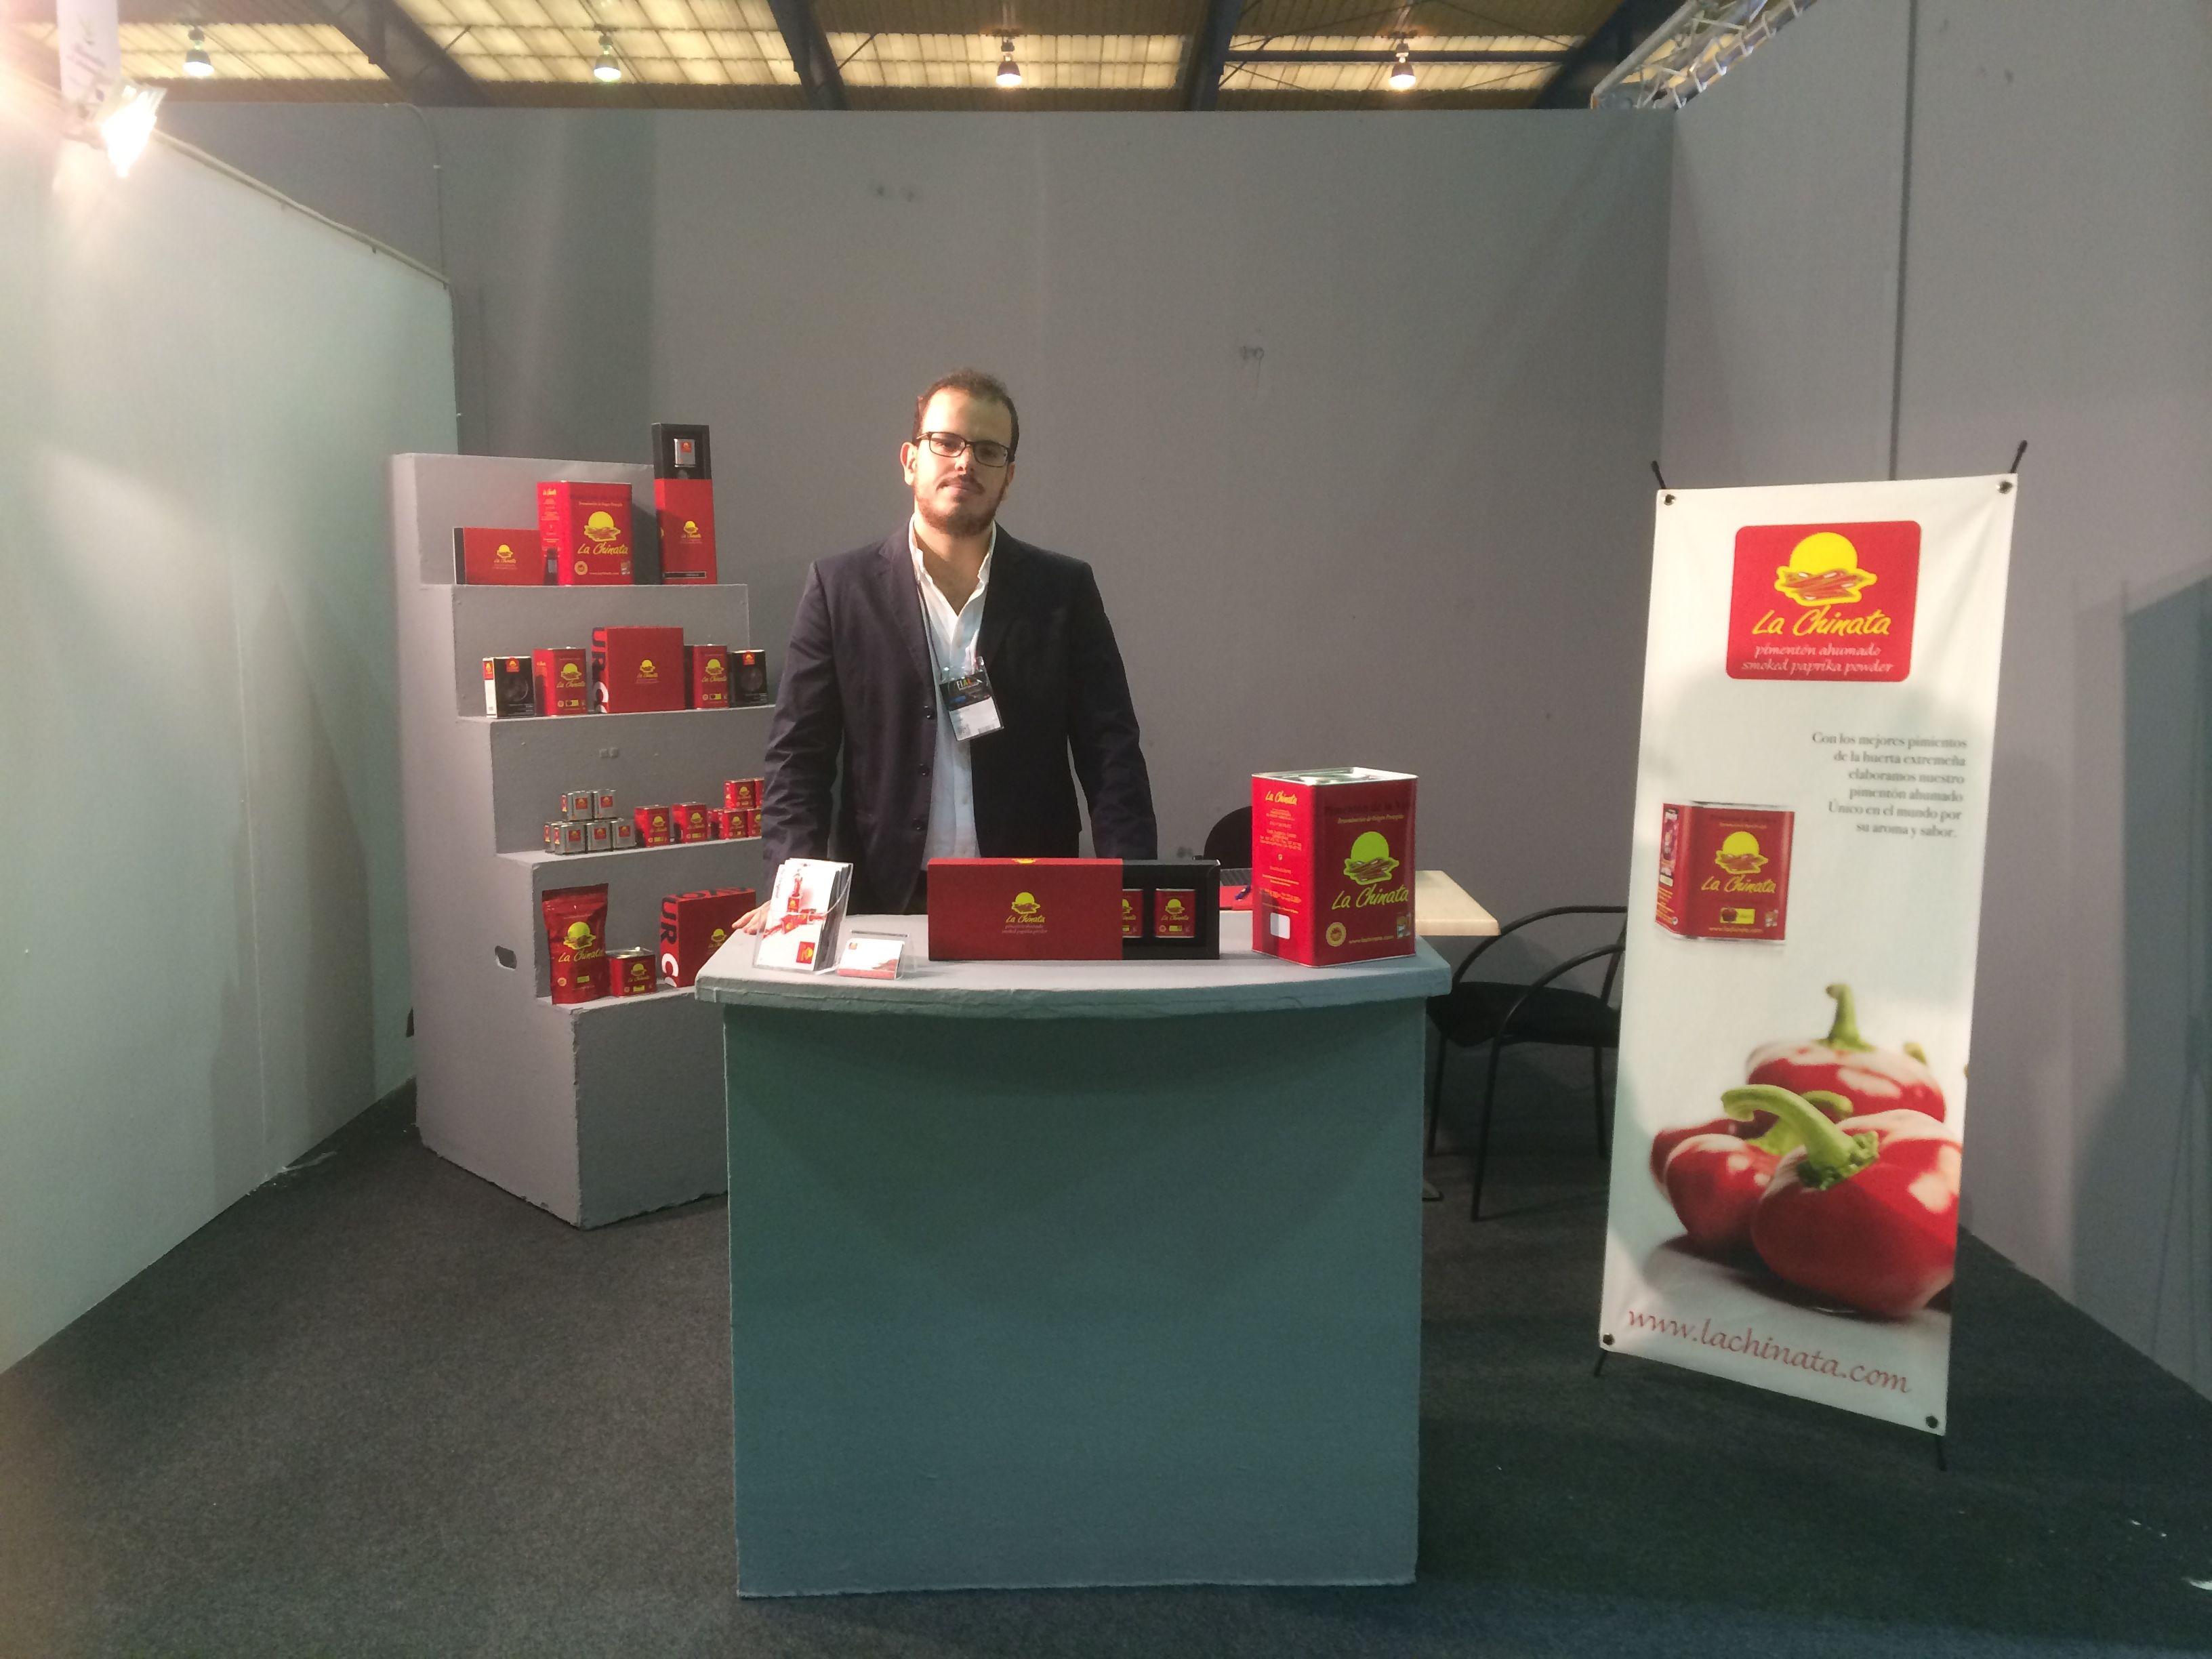 Feria Internacional de la Alimentación 2014 de Don Benito /This is our stand at Food International Fair FIAL  #pimentón #lachinata